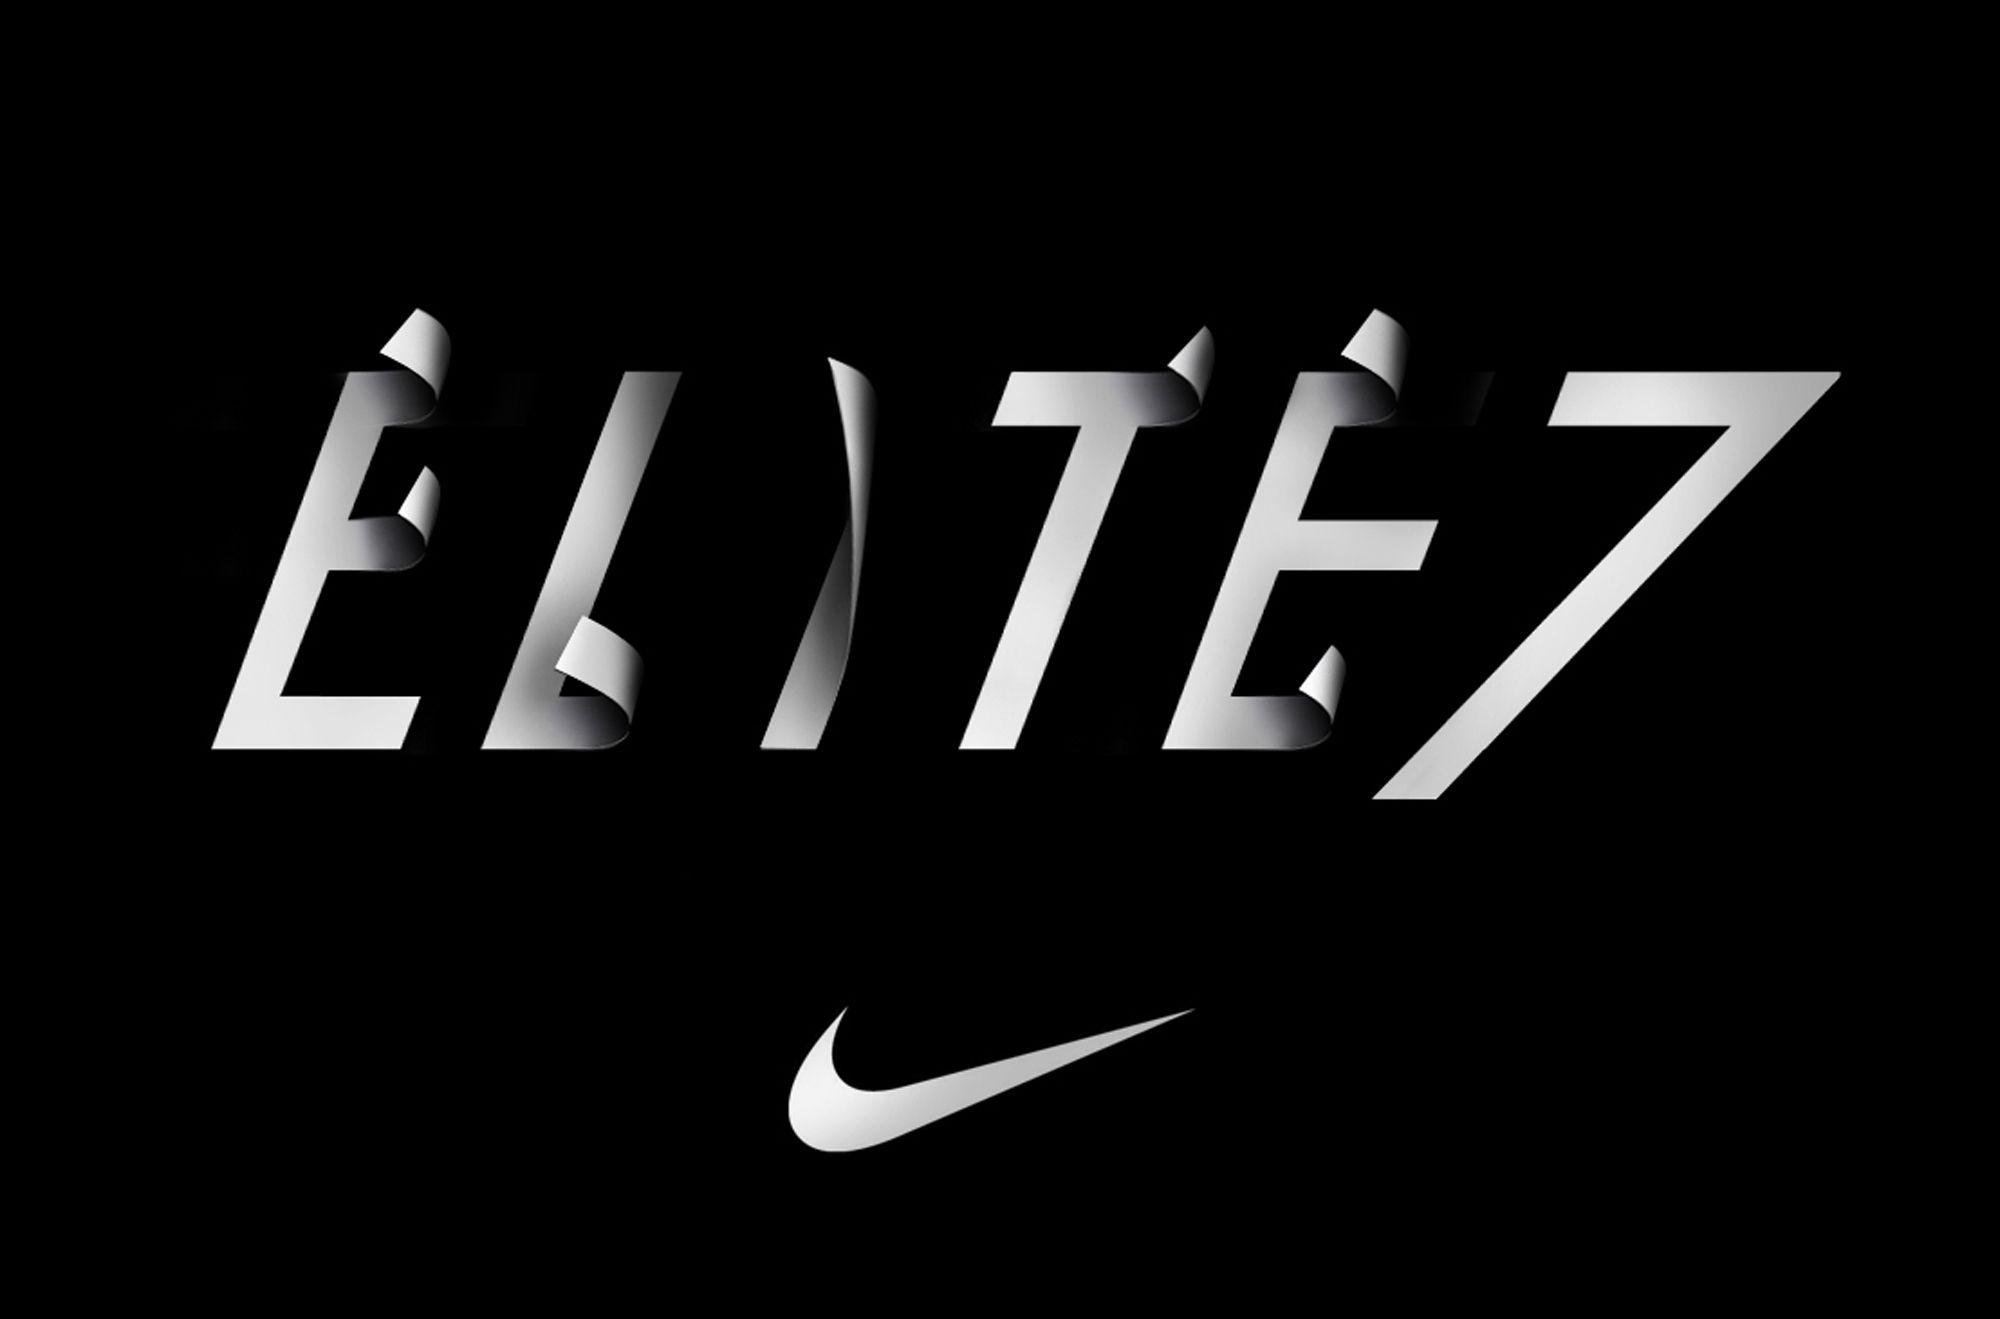 Elite 7 Nike.